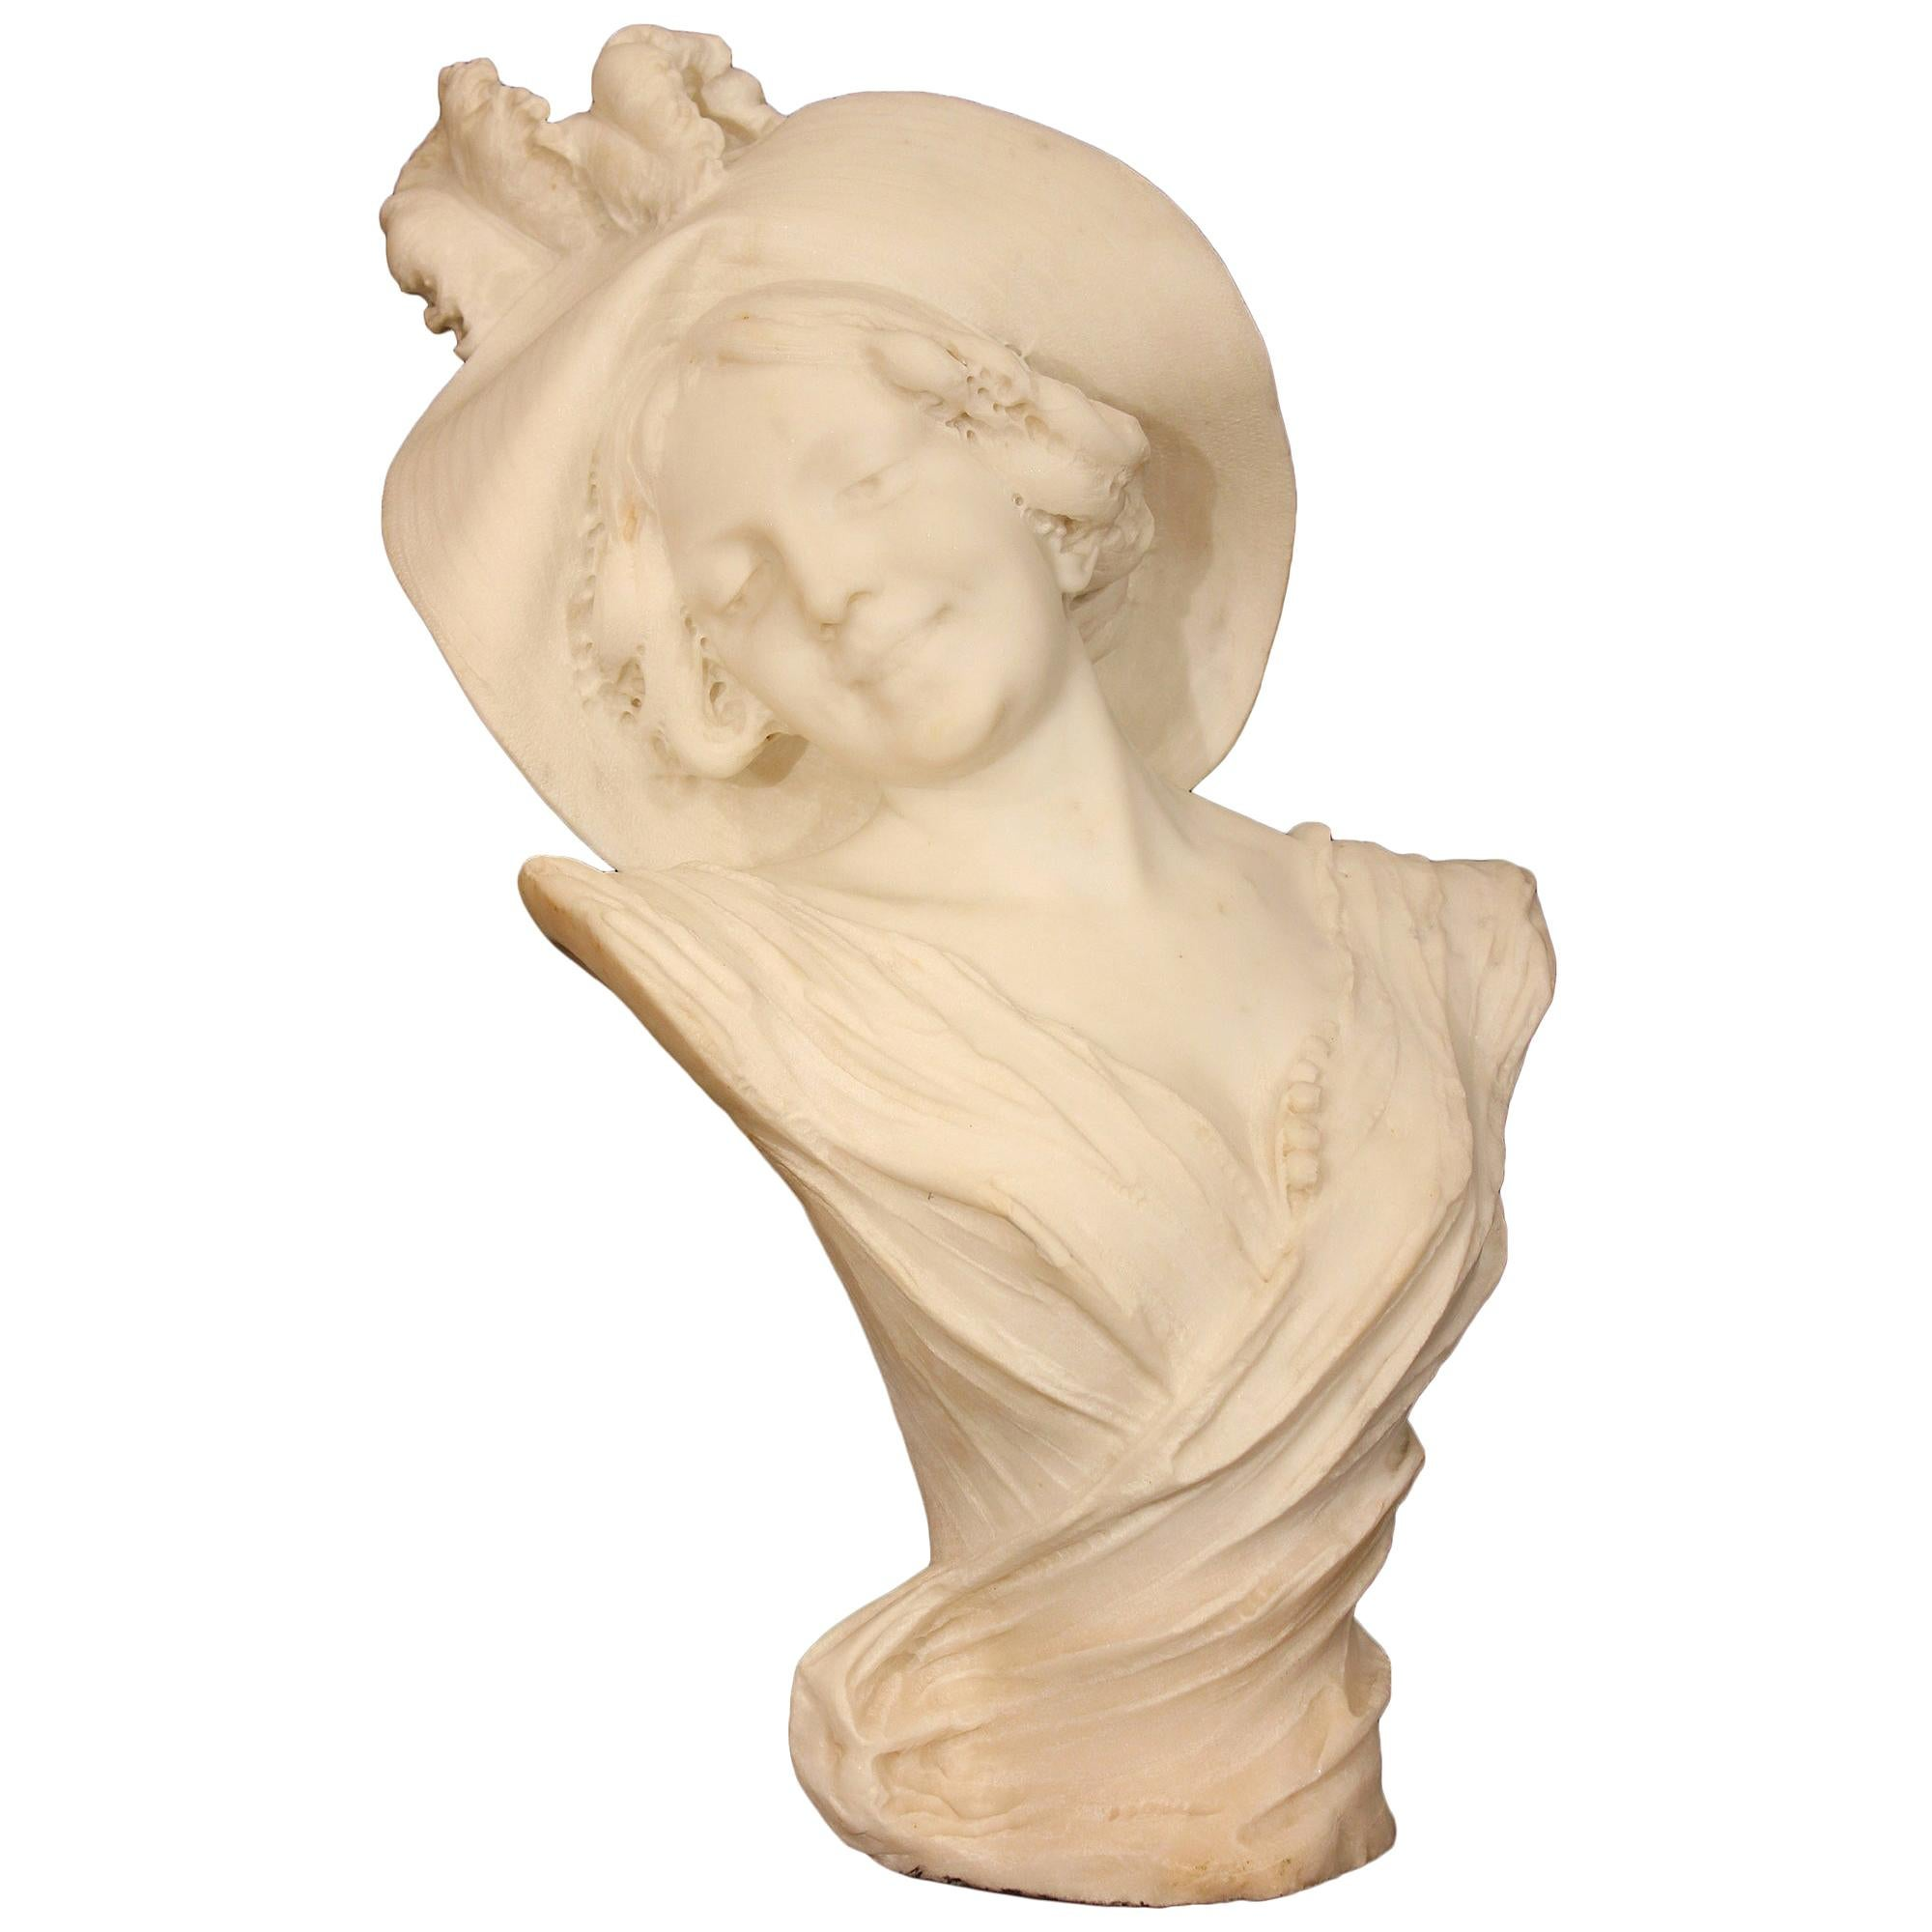 Italian Late 19th Century White Carrara Marble Bust, Signed Filli Pugi, Firenze